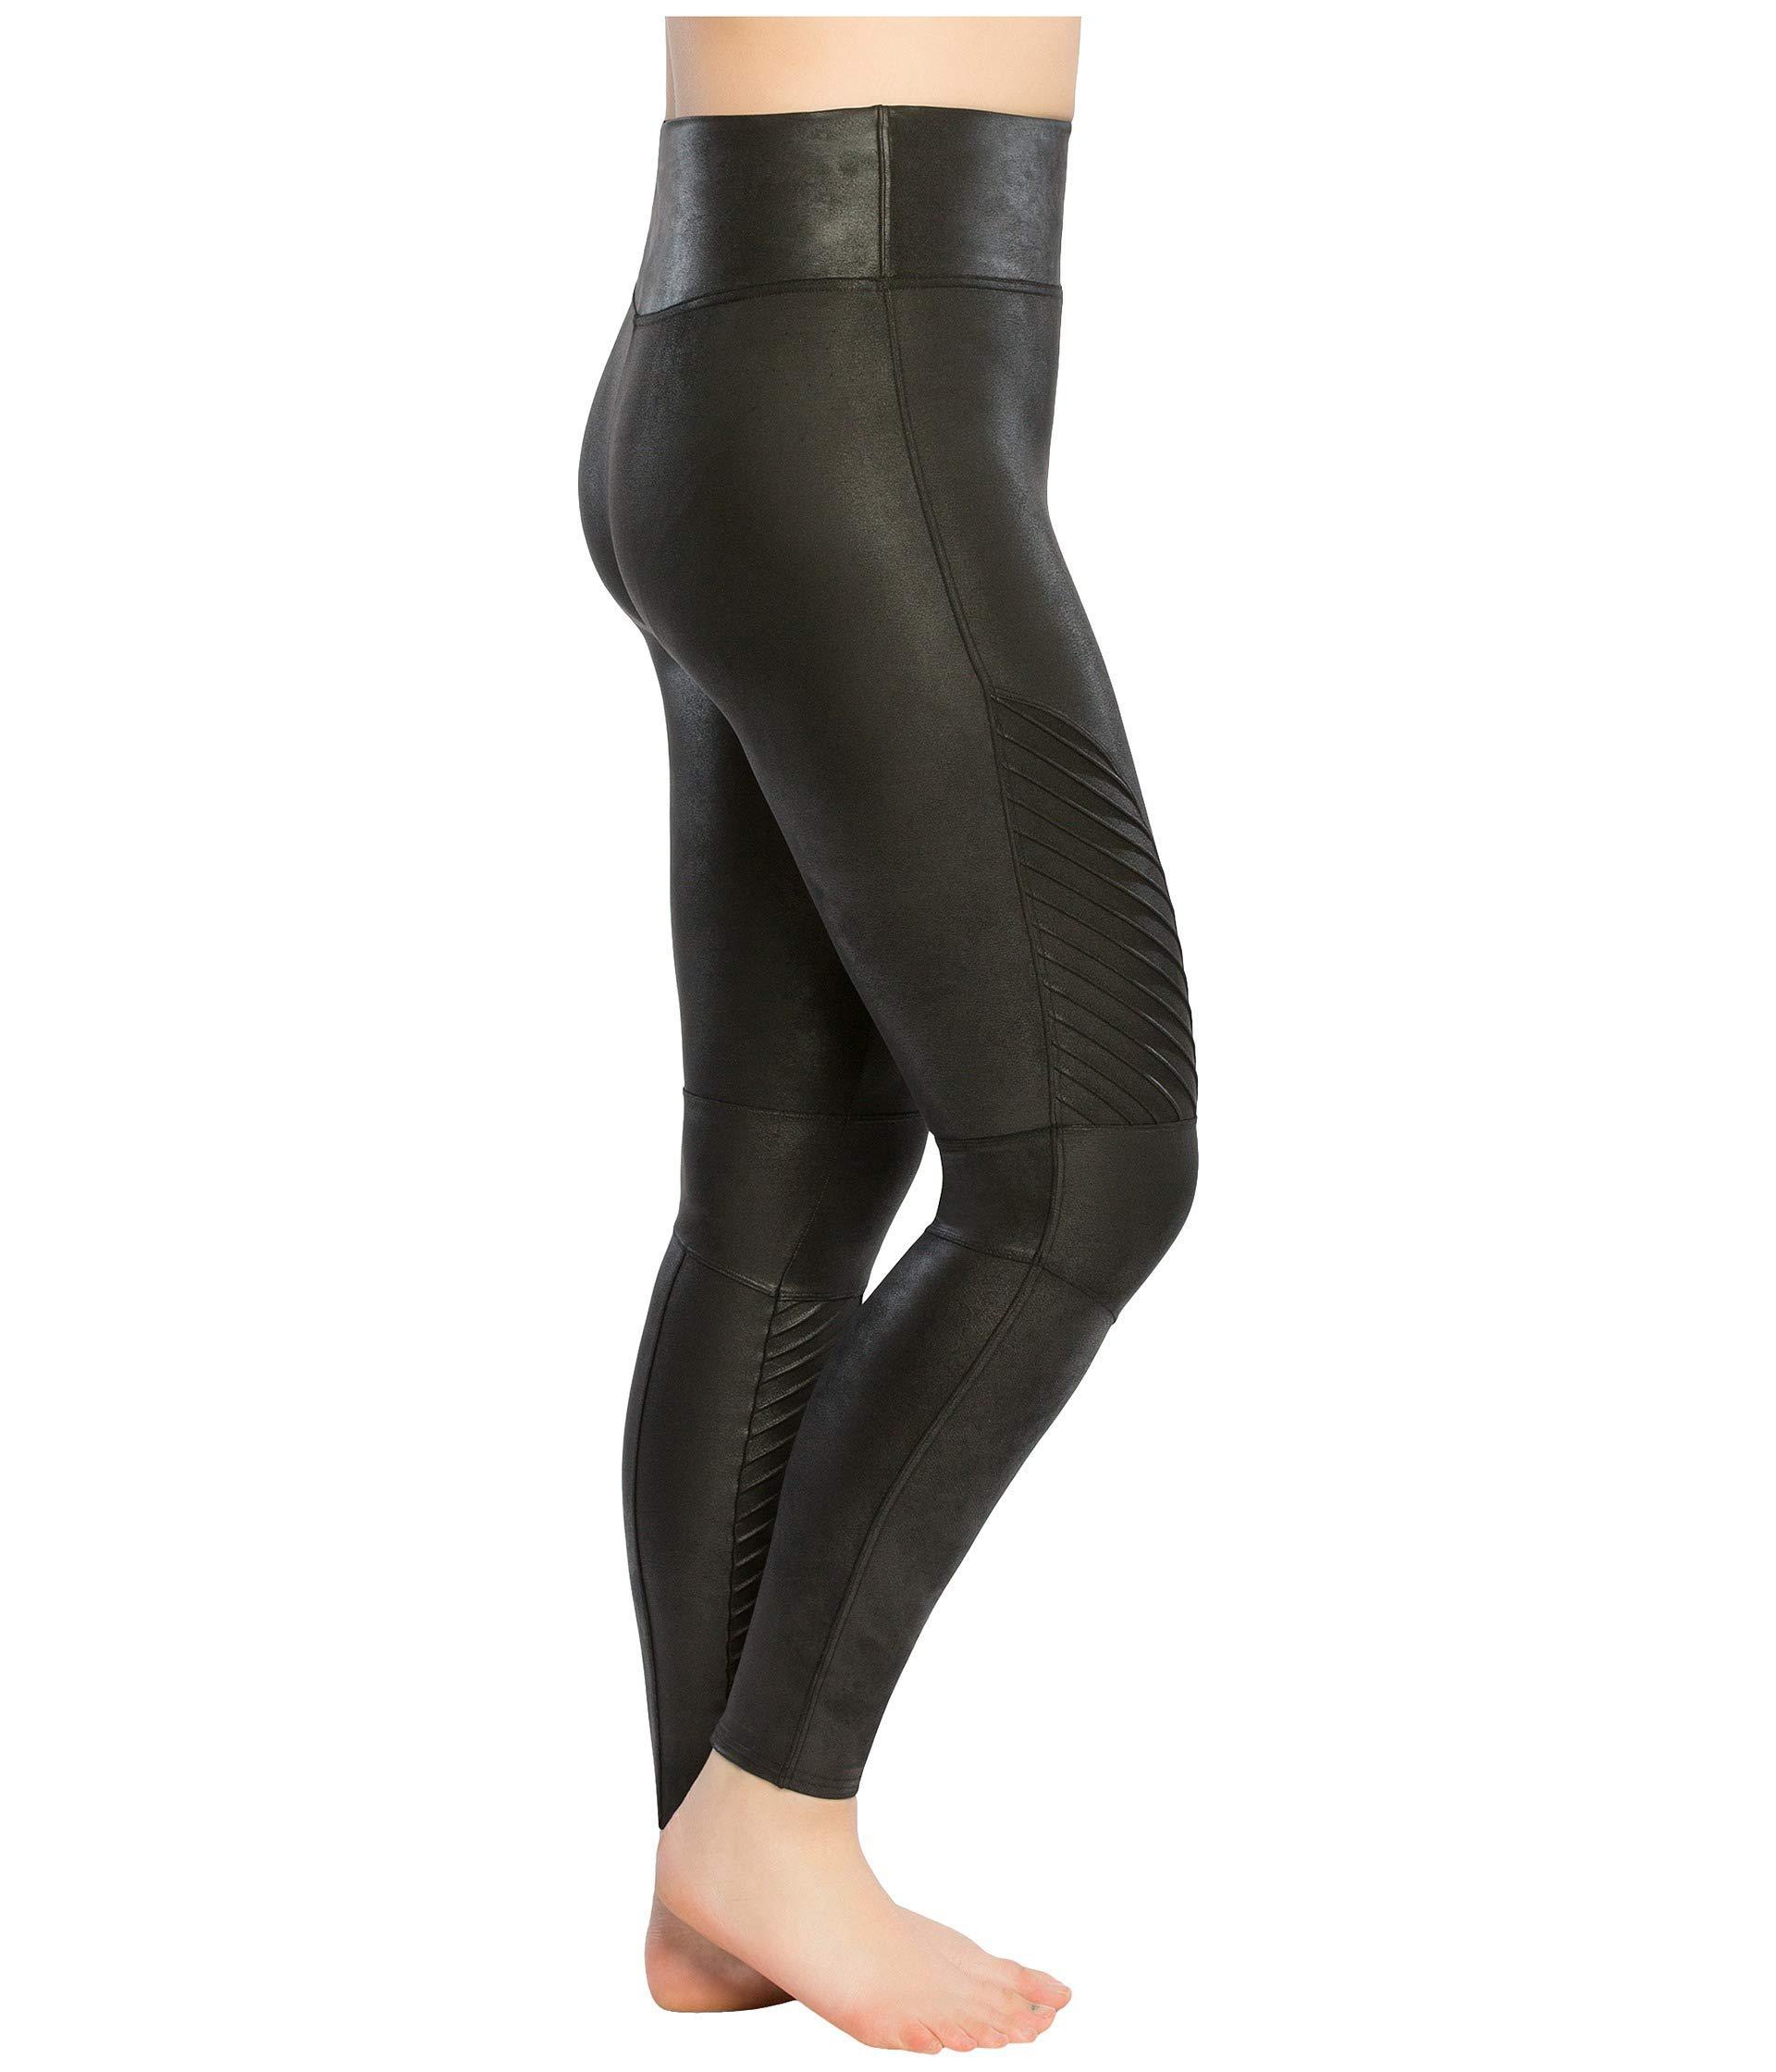 2b0e26d7e1b Lyst - Spanx Plus Size Faux Leather Moto Leggings (very Black) Women s  Casual Pants in Black